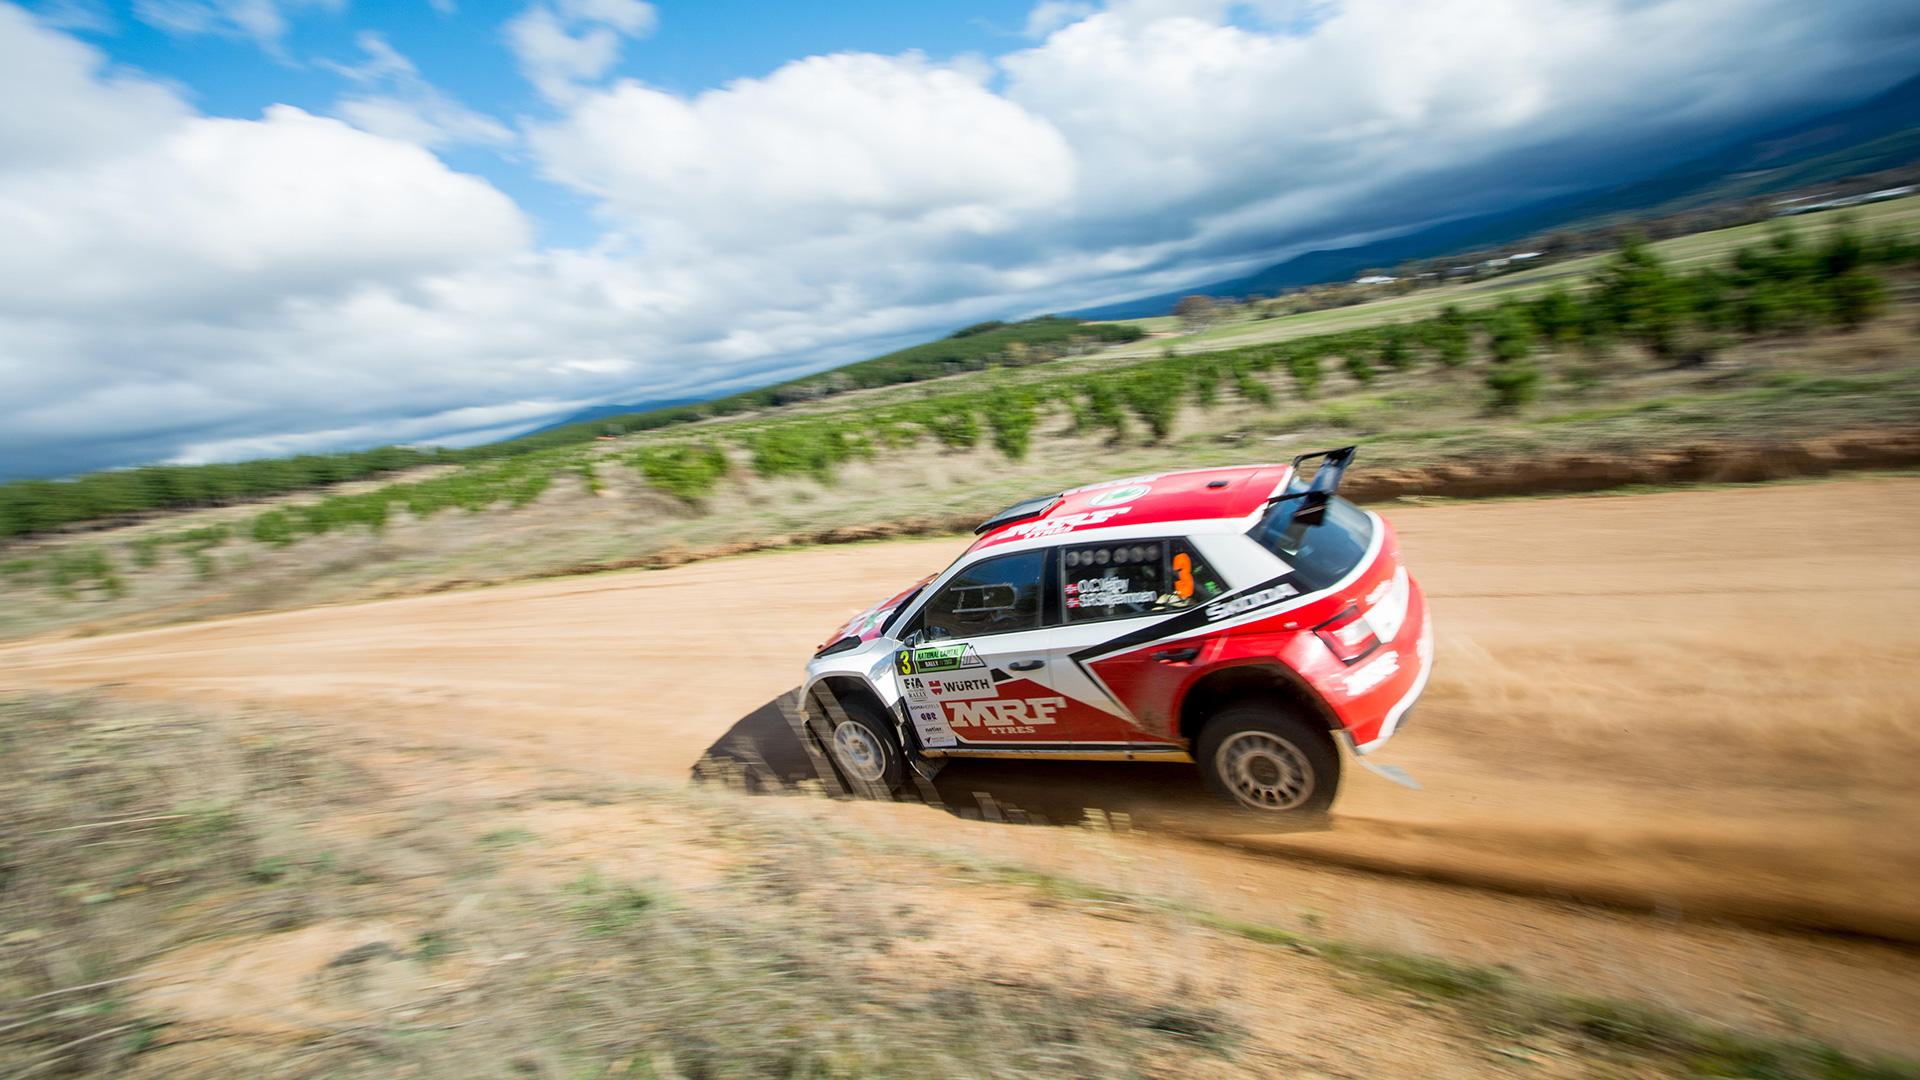 Ole Christian Veiby / Stig Skjarmoen, ŠKODA FABIA R5, ŠKODA Team MRF. Rally of Canberra 2017 (Foto: RacerViews)